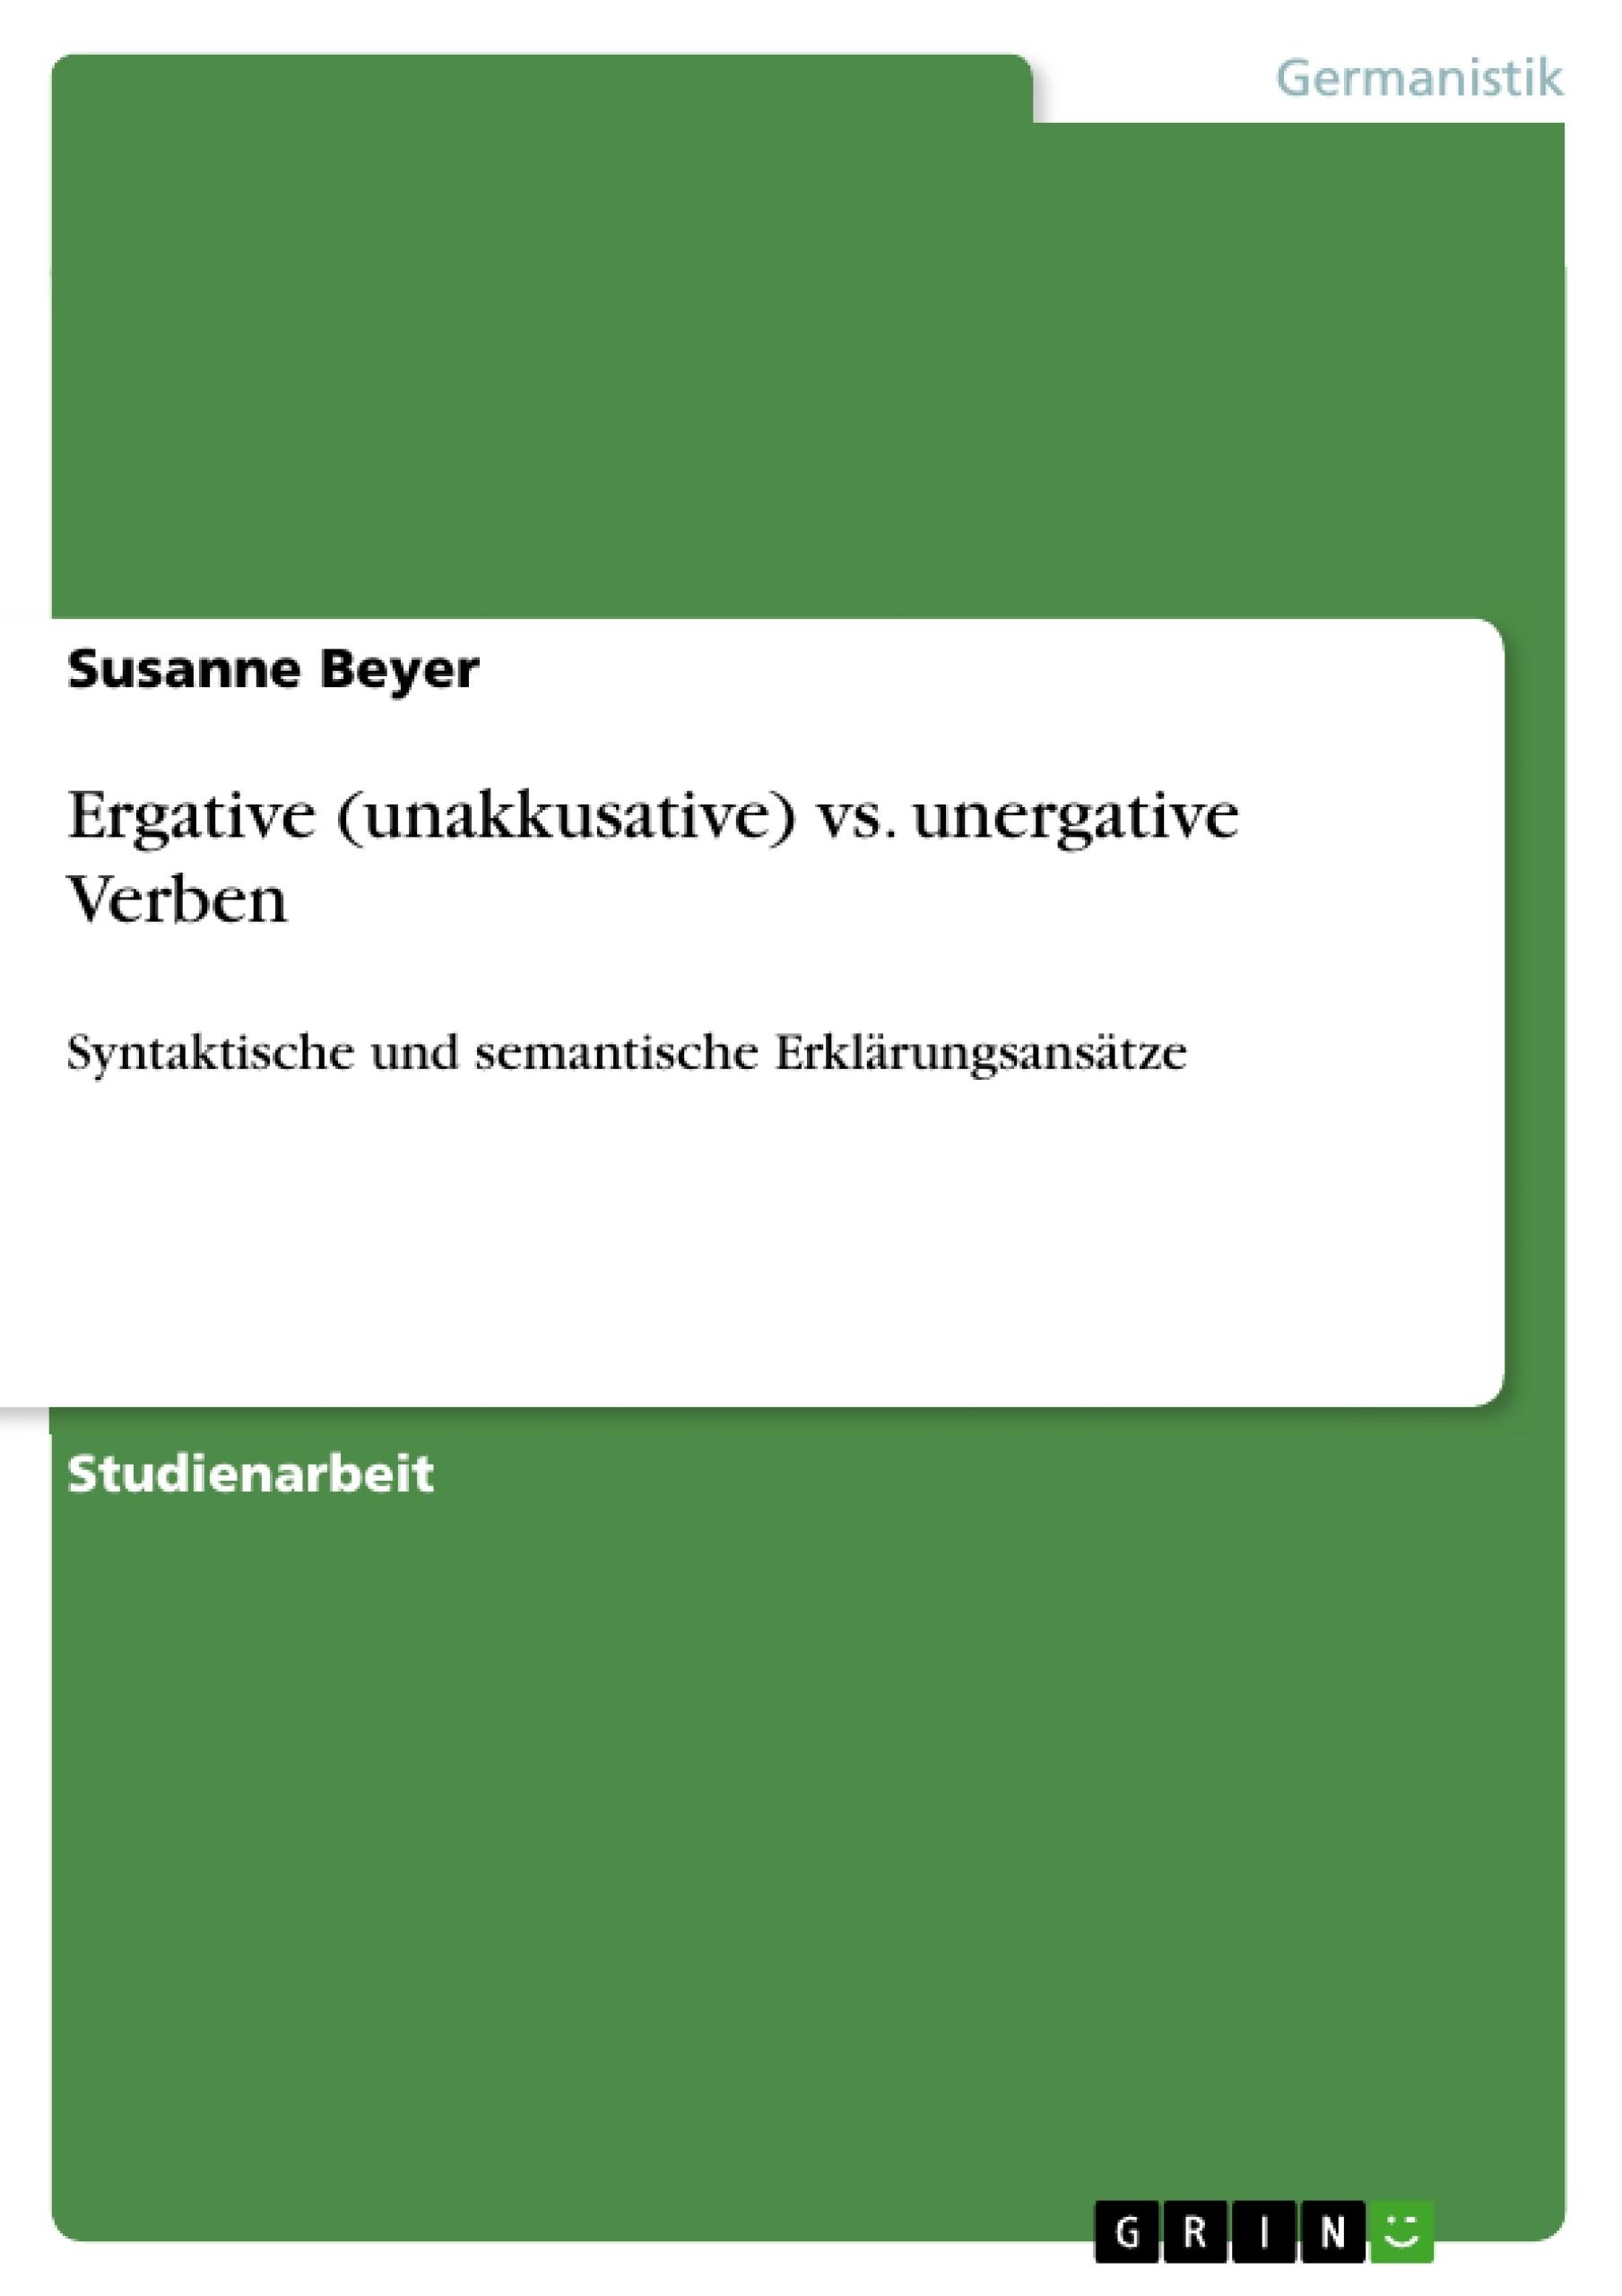 Titel: Ergative (unakkusative) vs. unergative Verben